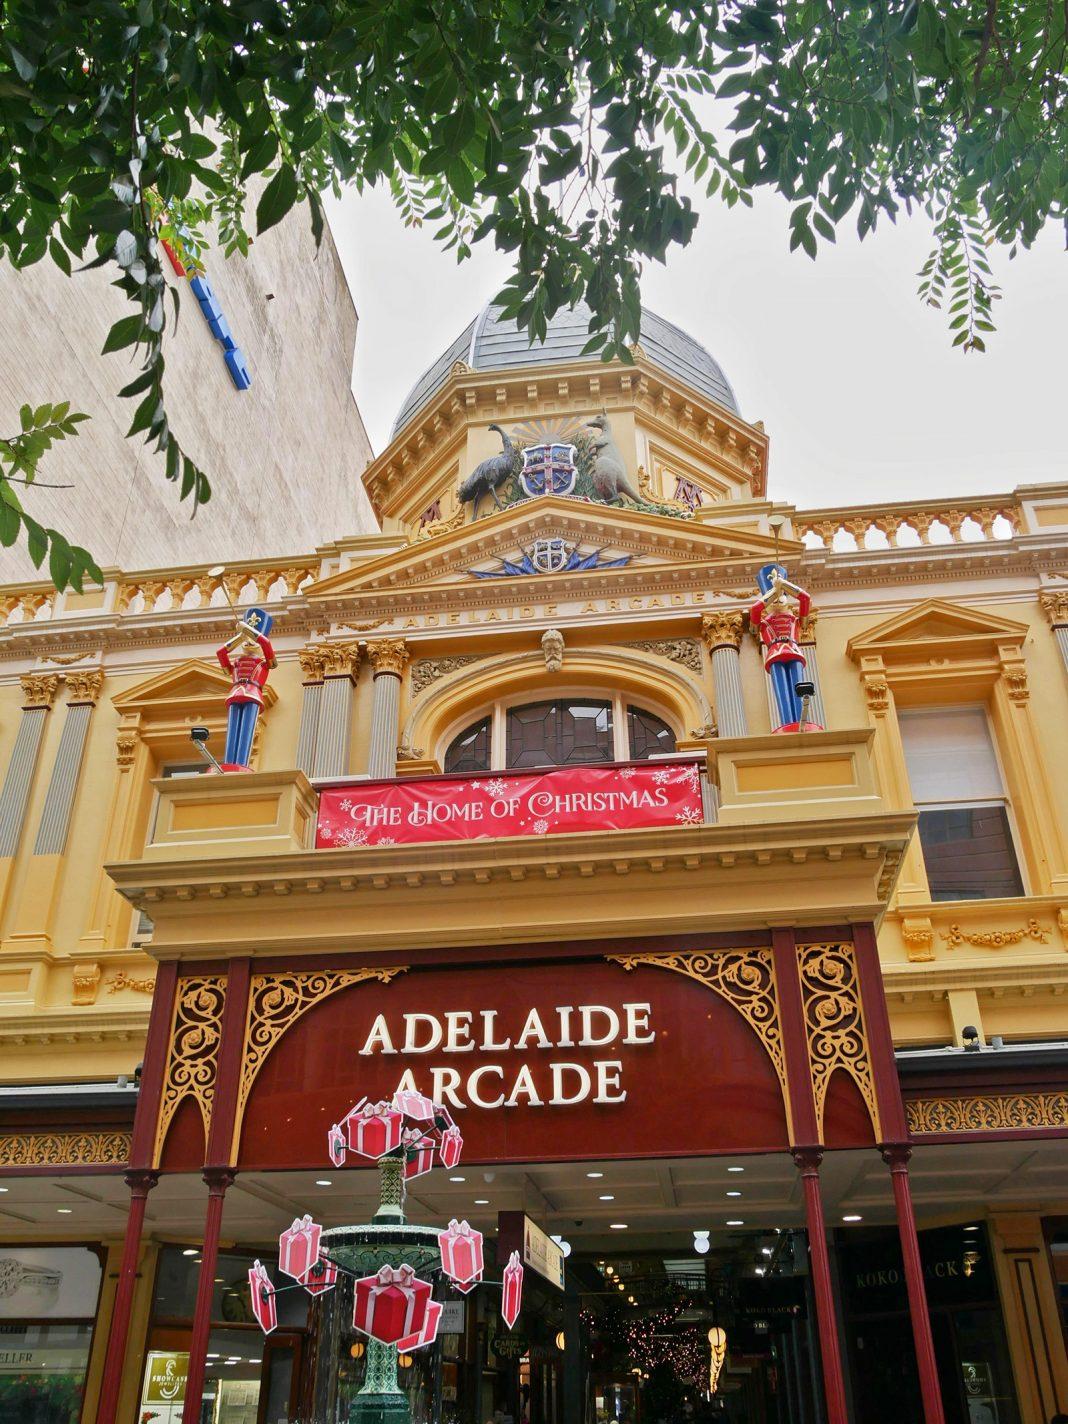 Adelaide Arcade, in kerstsfeer - Bezienswaardigheden Adelaide